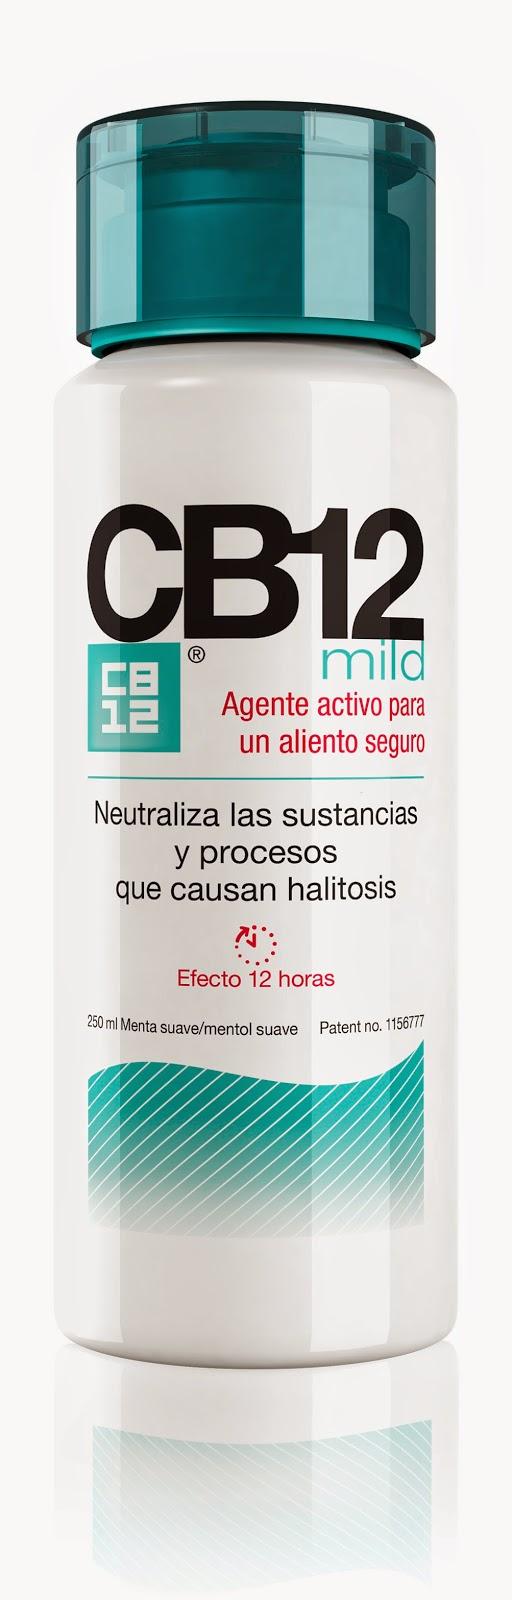 cb12 mint mal aliento